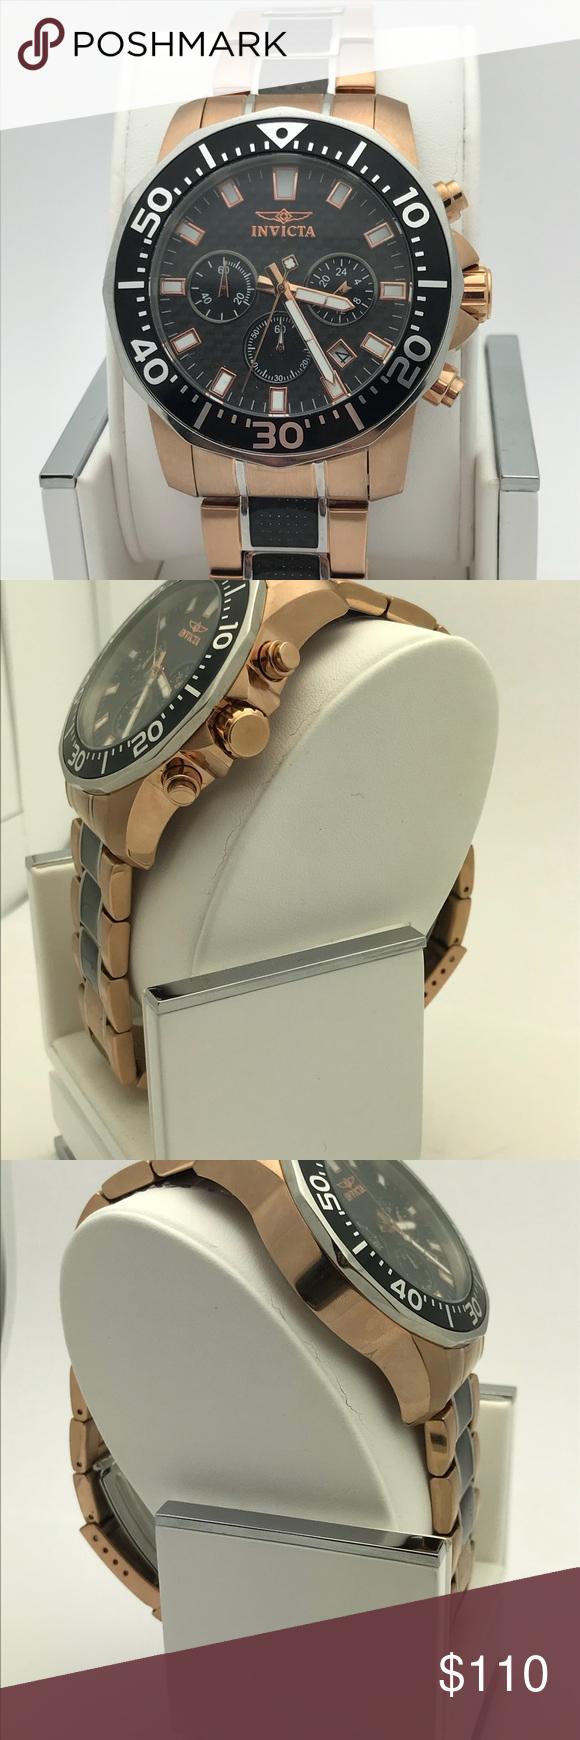 Invicta Menus Pro Diver Watch Ionplated stainless steel watch